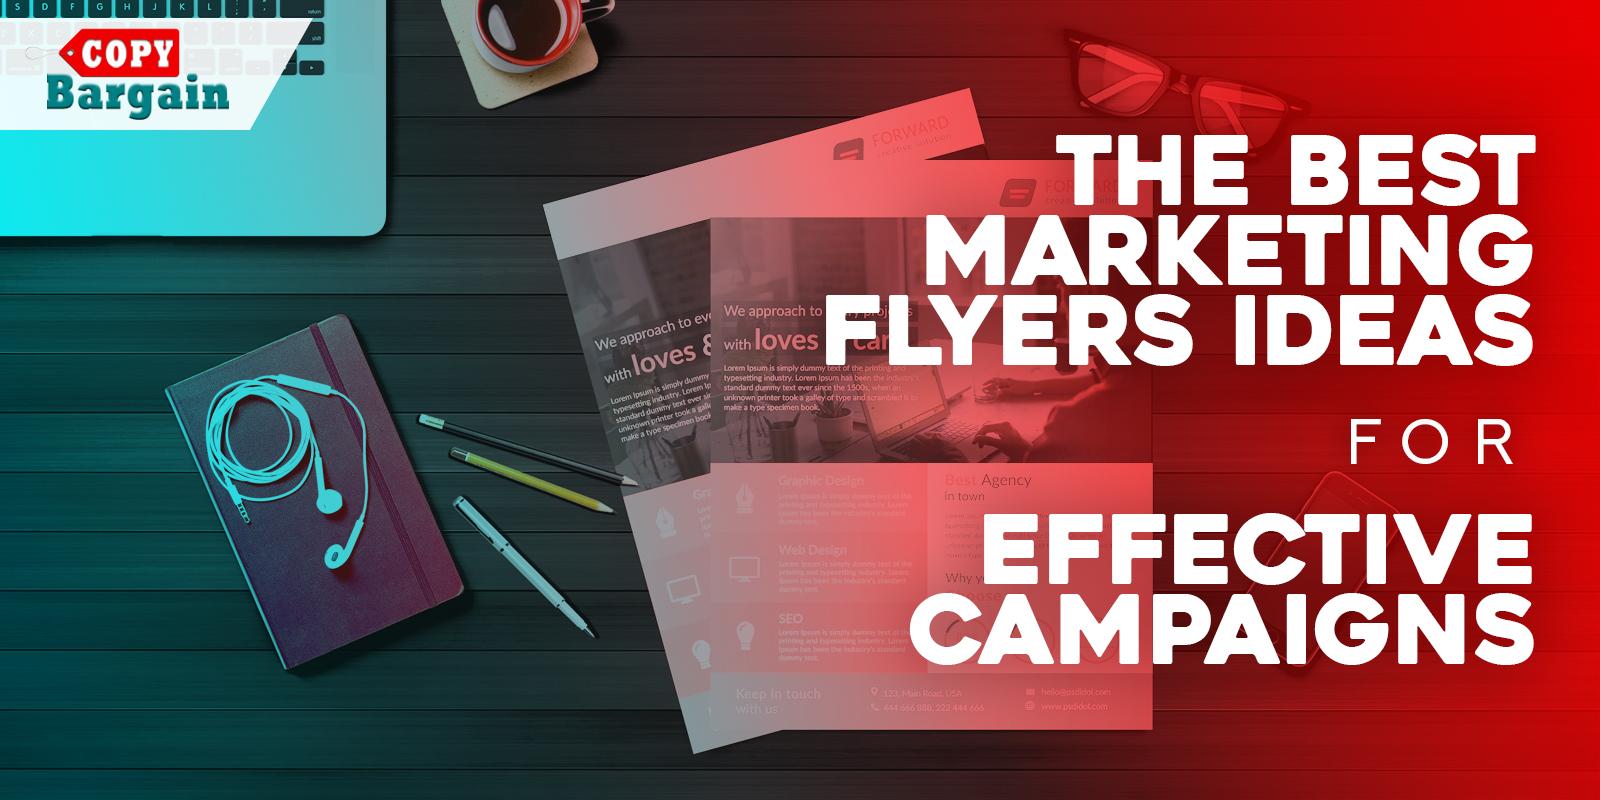 marketing flyers ideas